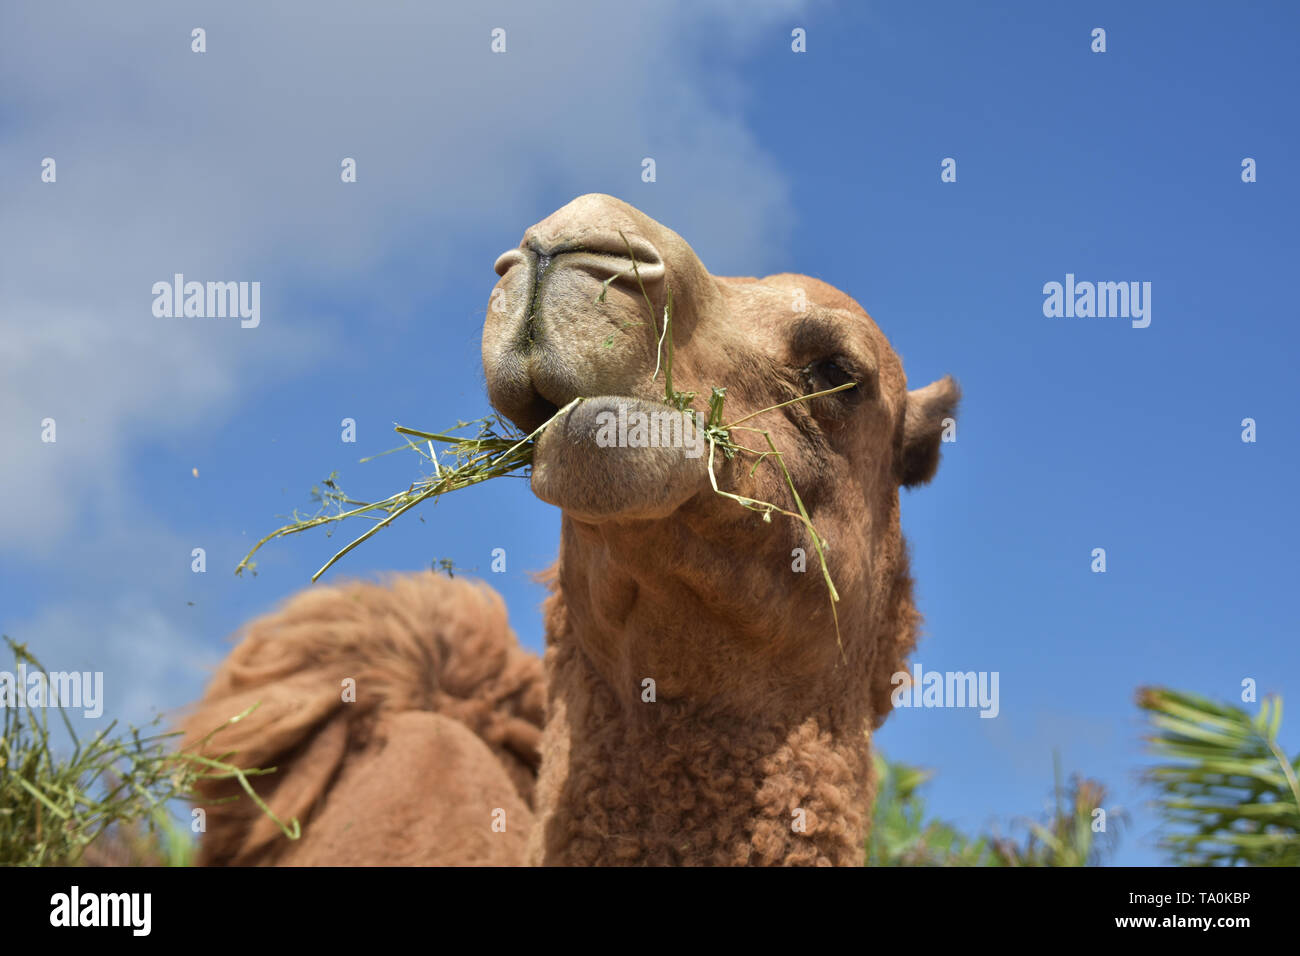 82de731d761a Camel Chewing Stockfotos & Camel Chewing Bilder - Alamy